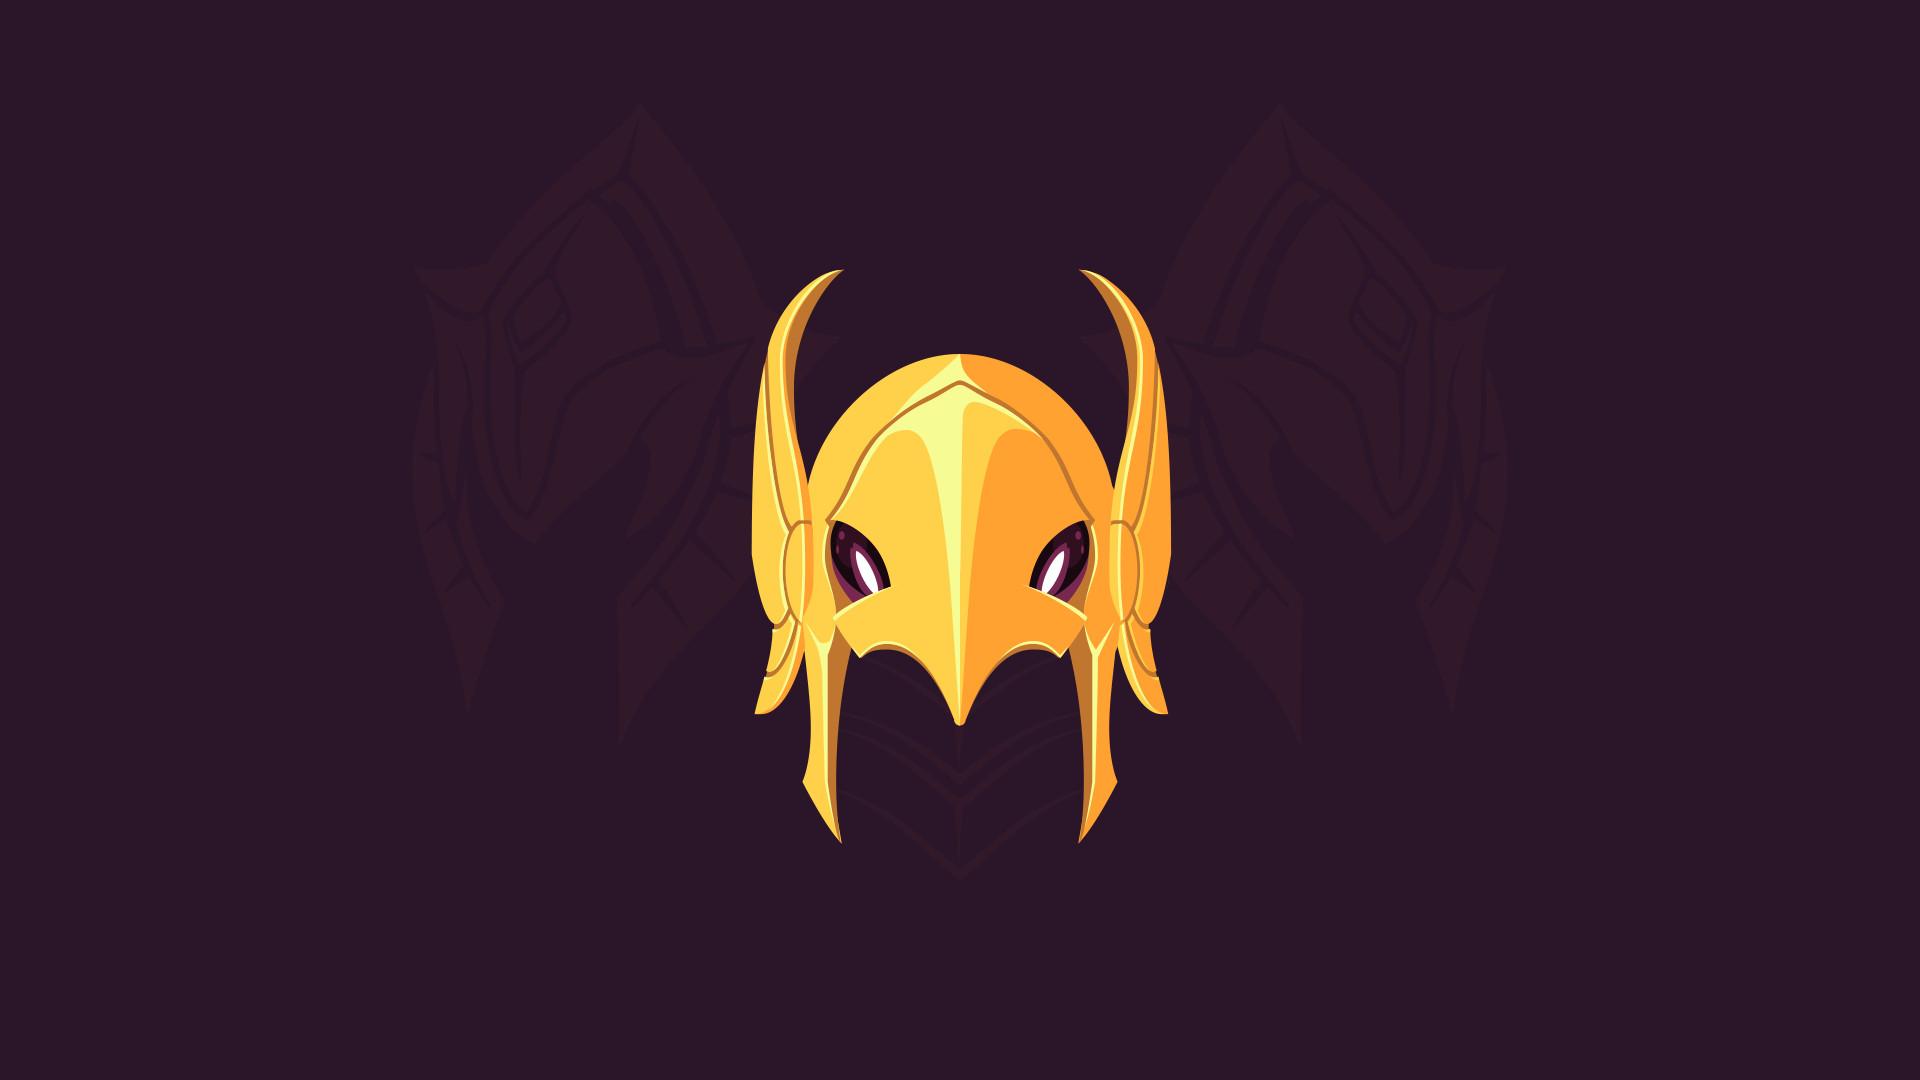 illustration video games League of Legends logo armor Azir bat computer  wallpaper font